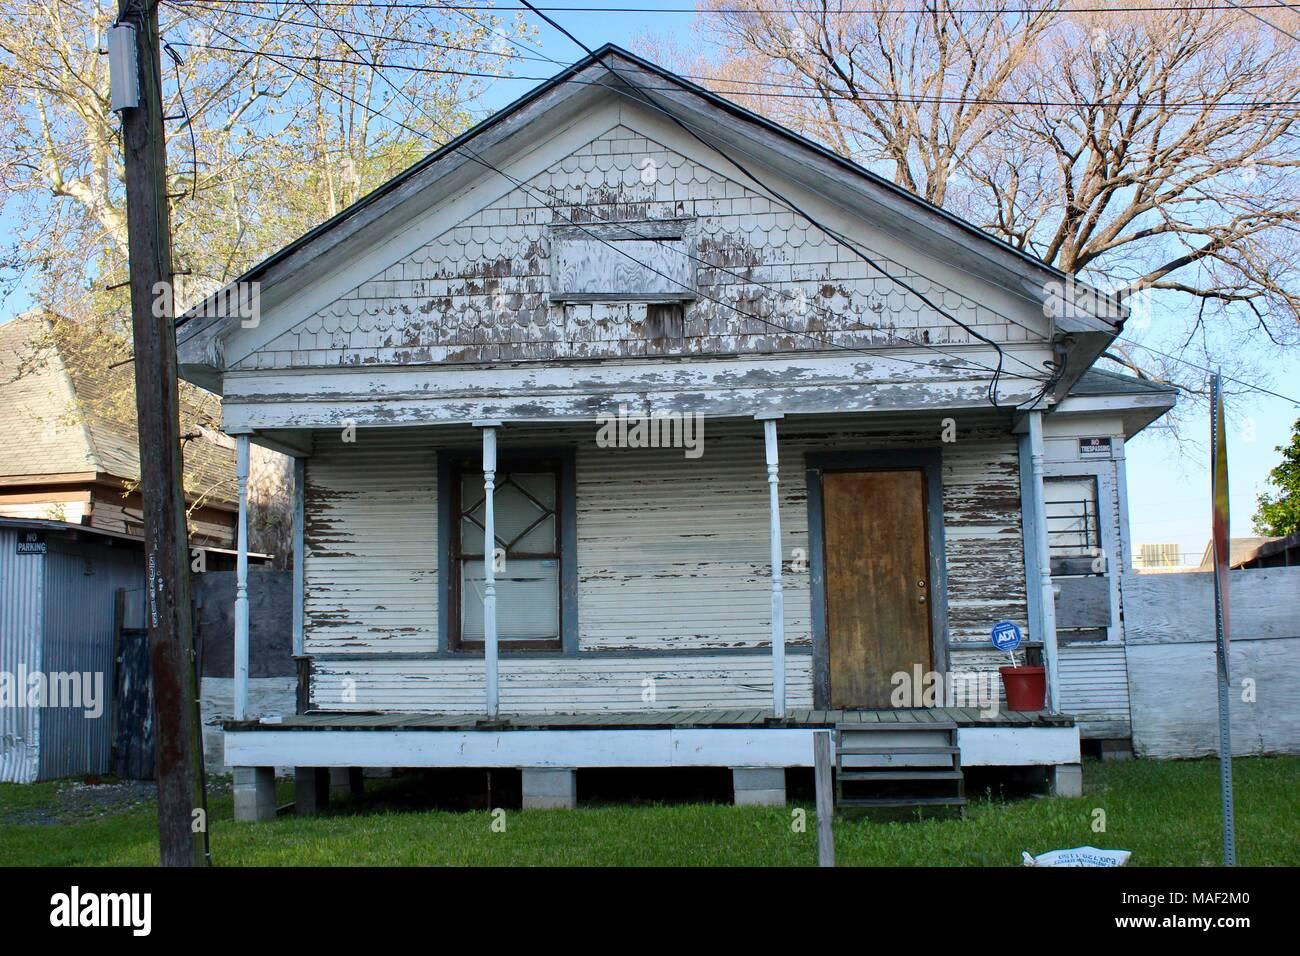 Alte Holzerne Shotgun Shack Stil Haus Aus Holz Houston Texas Usa